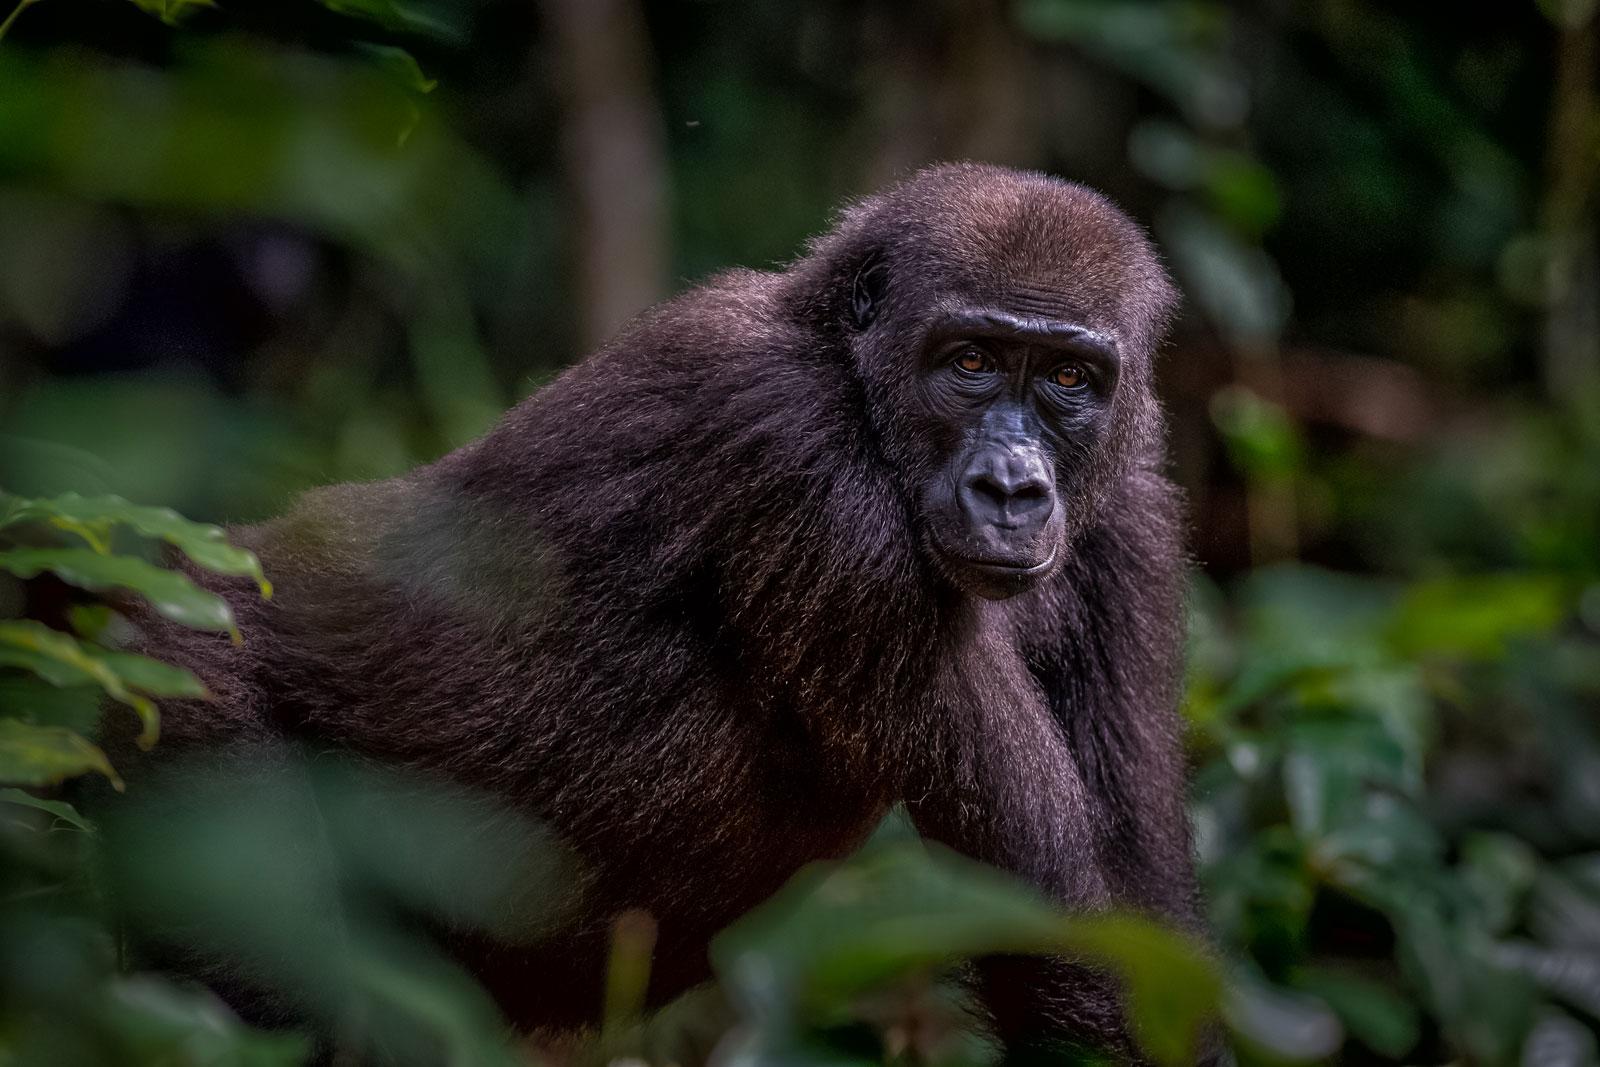 congo-gorillas-2_Michael-Viljoen